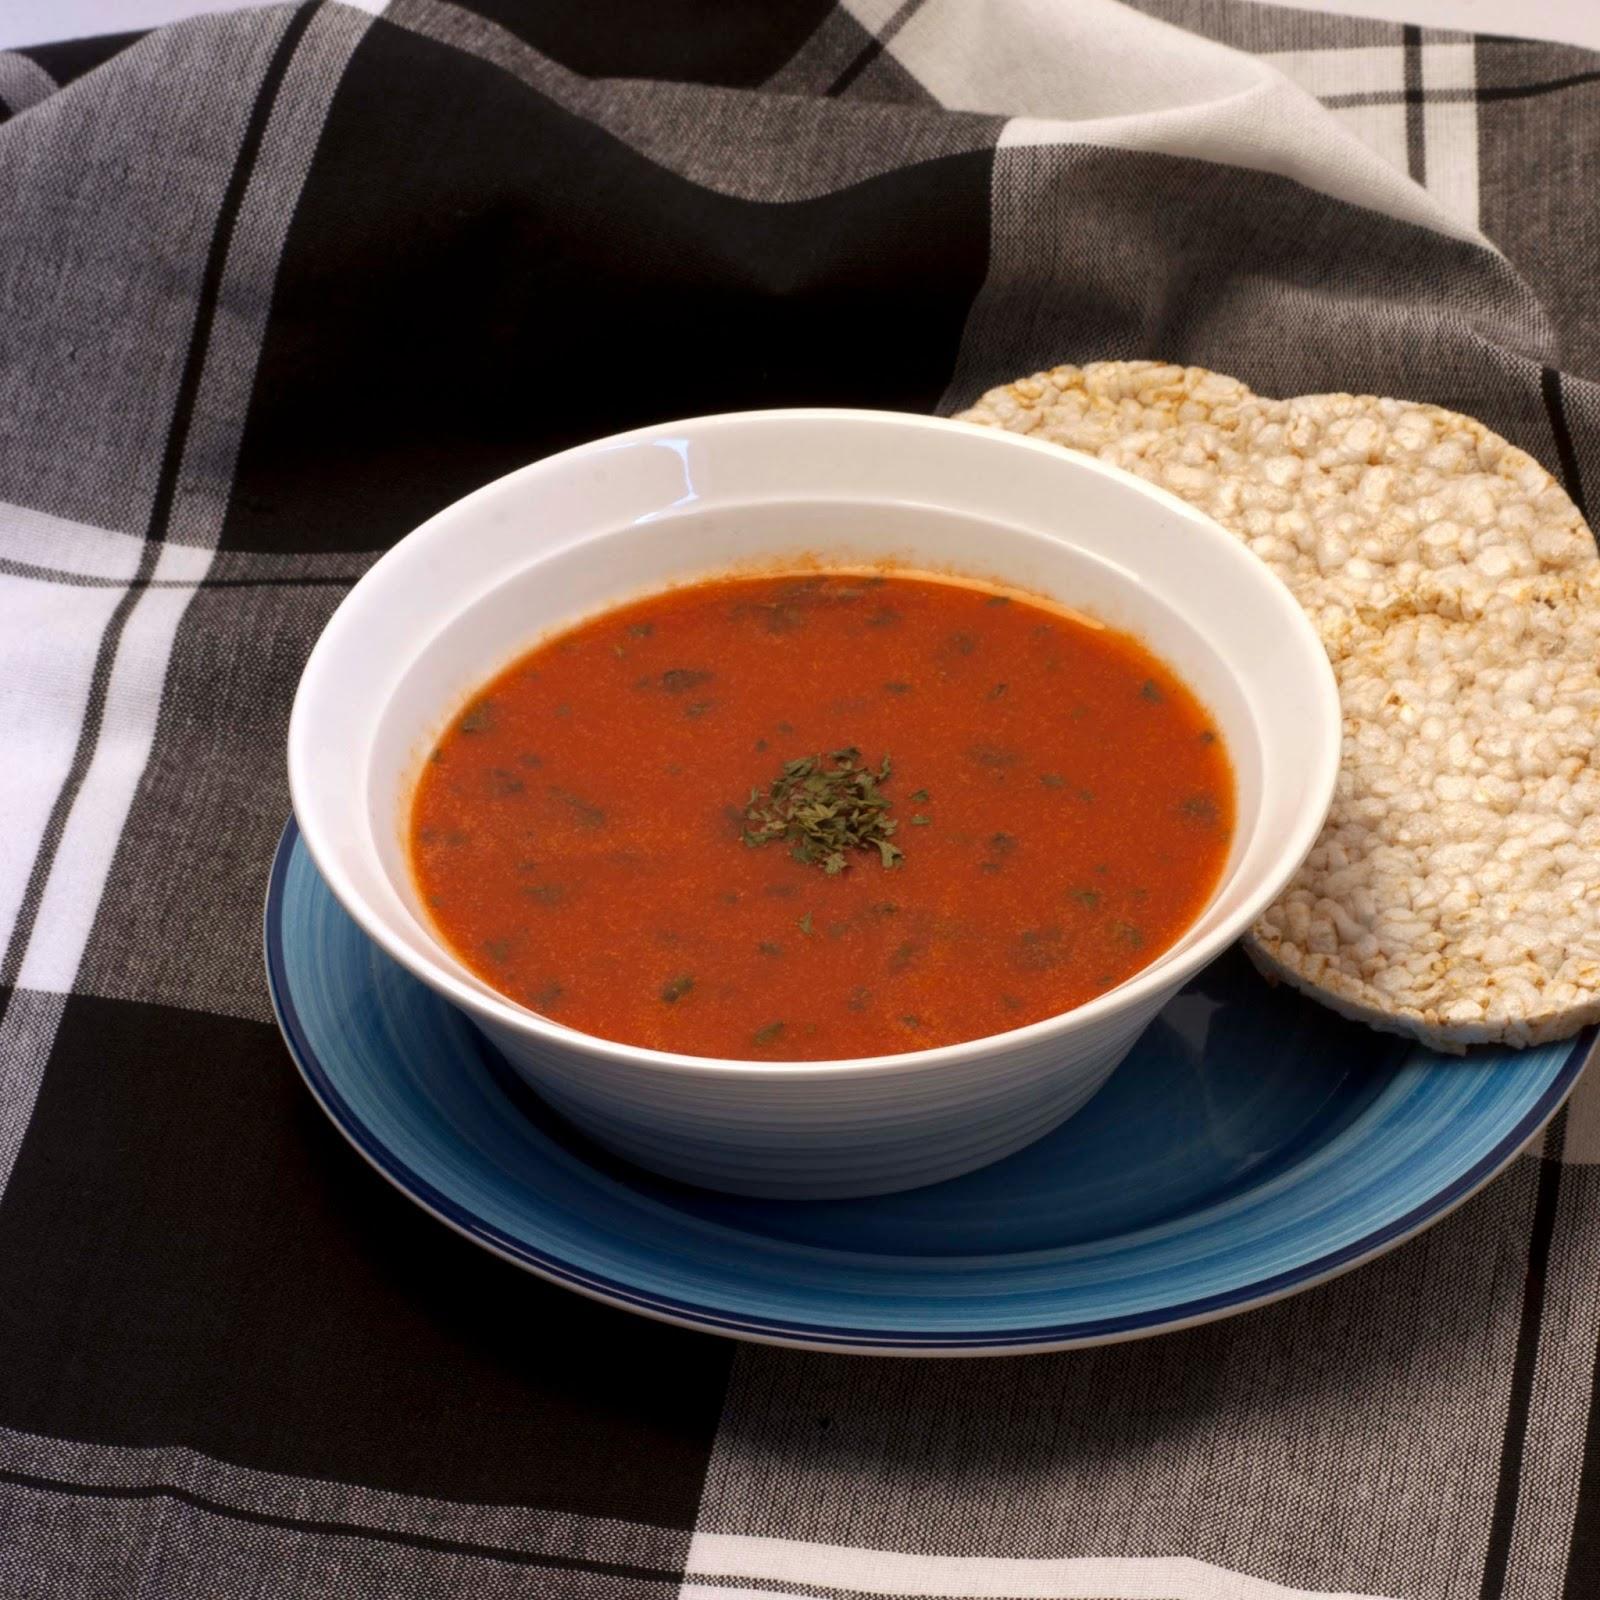 'Creamy' Tomato and Almond Soup